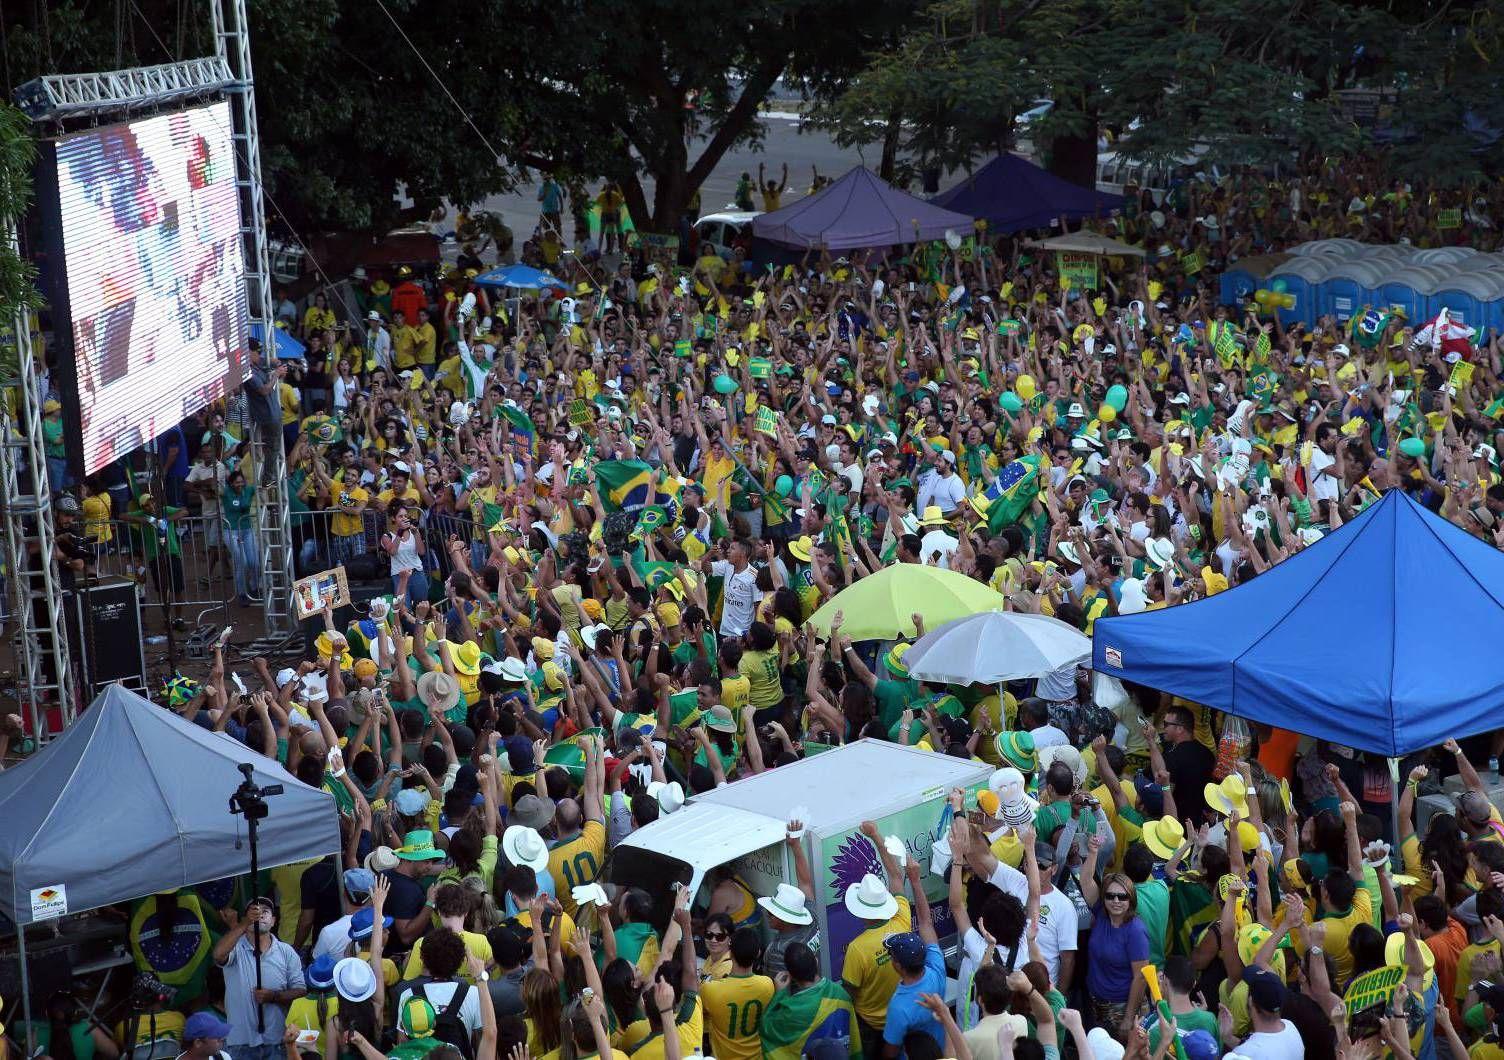 Entenda os próximos passos do processo de impeachment de Dilma Rousseff